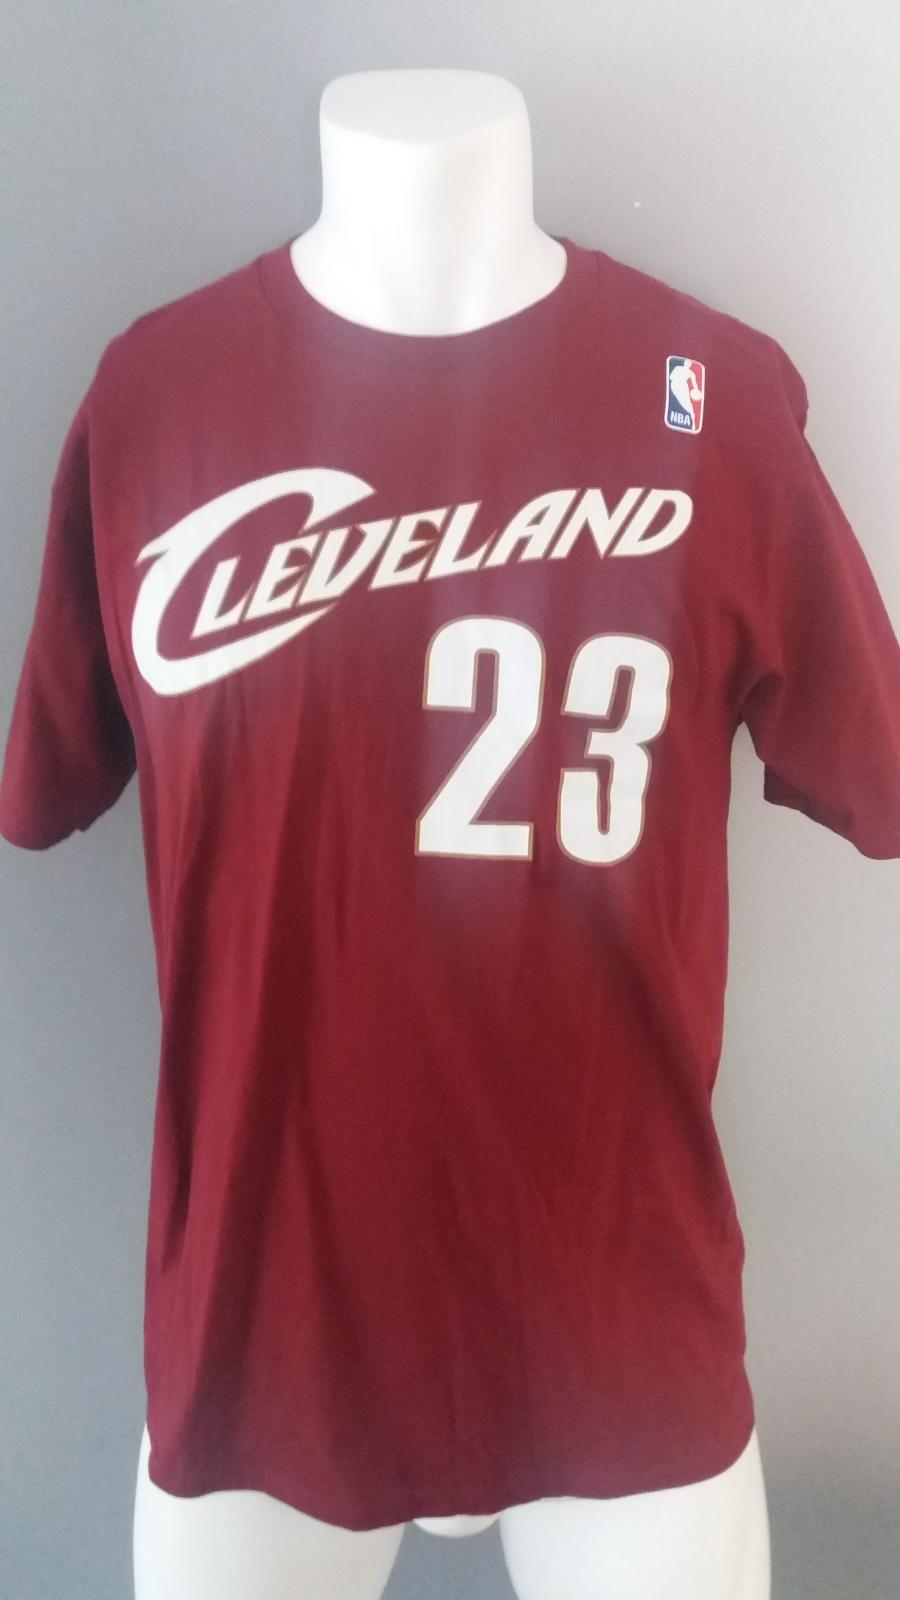 Jersey - T-shirt - Hombre - Lebron James - Cleveland Cavaliers - Alternate - Adidas